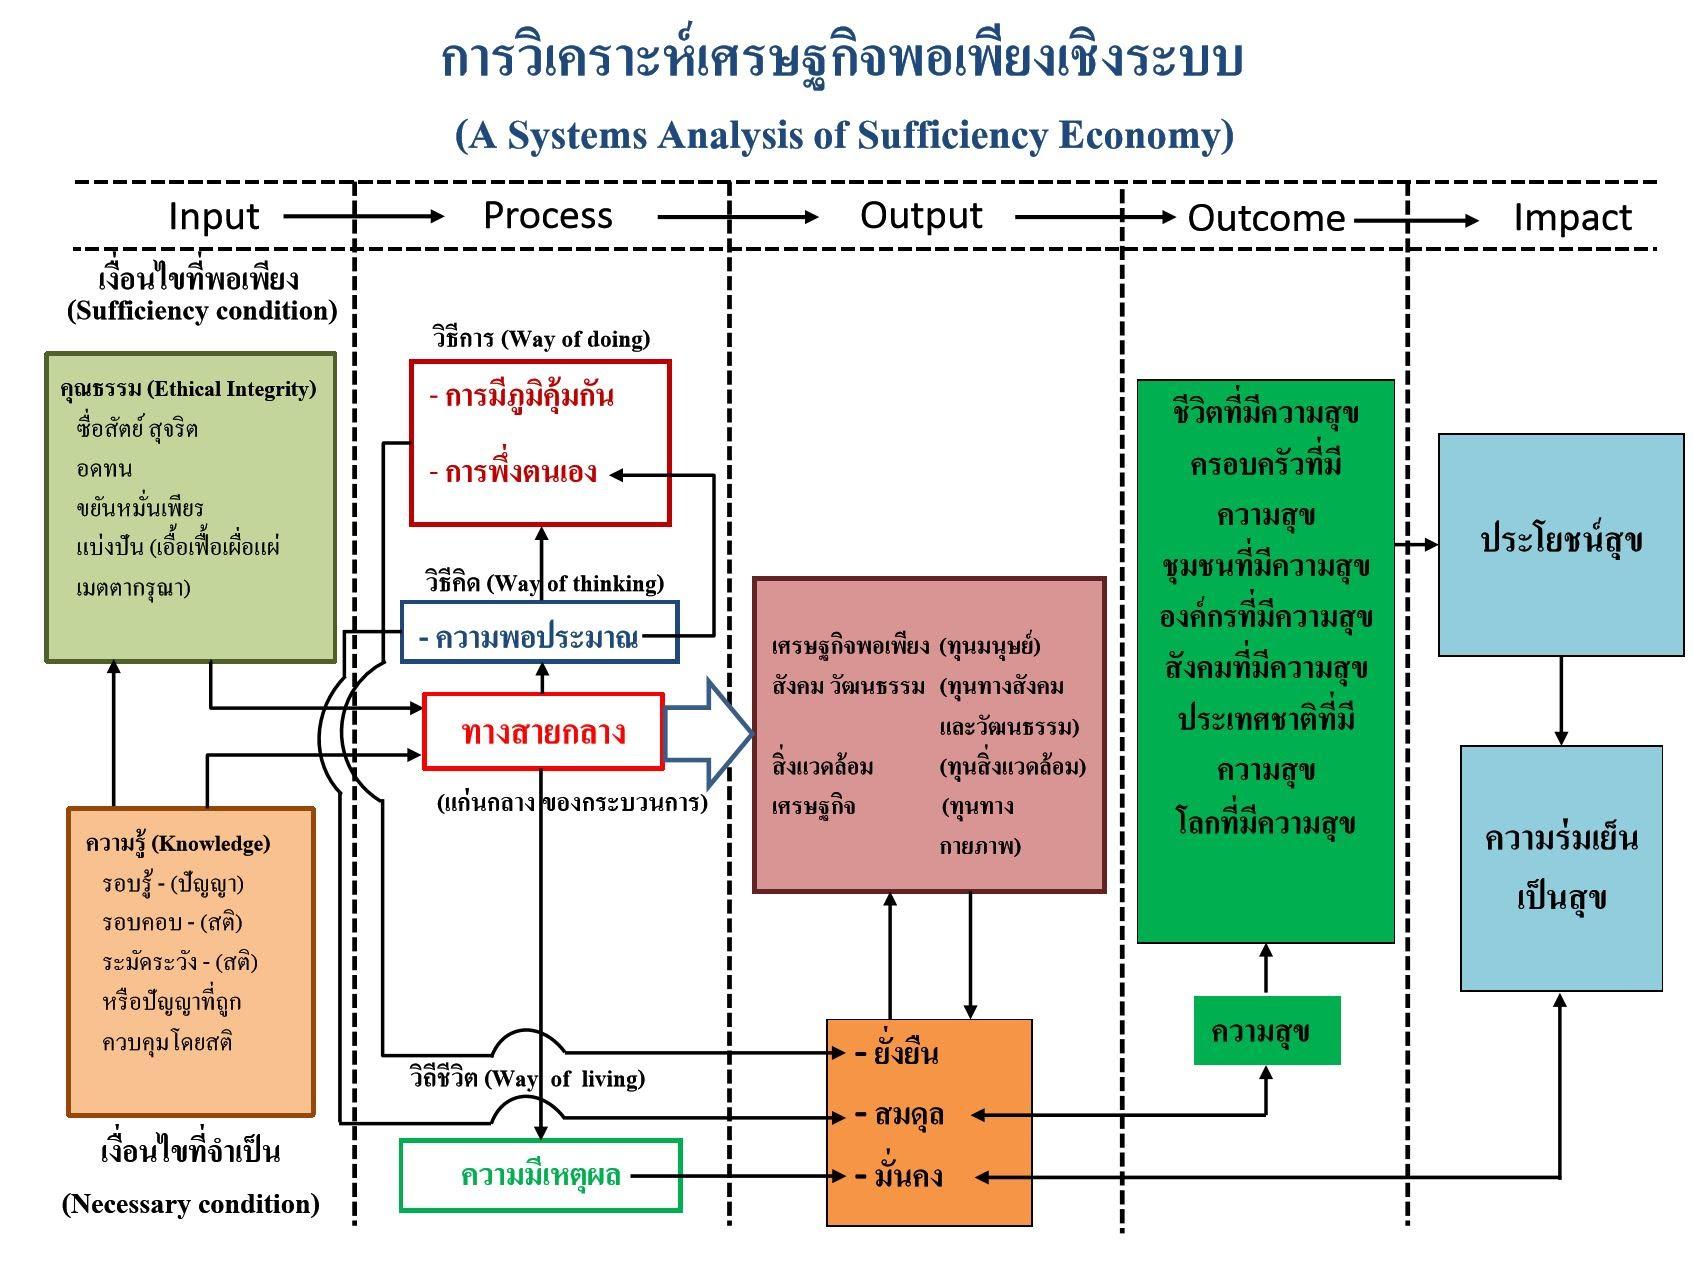 https://sites.google.com/a/hi-supervisory5.net/npt2/bukhlakr/kerin/practice-model/66524912b.jpg